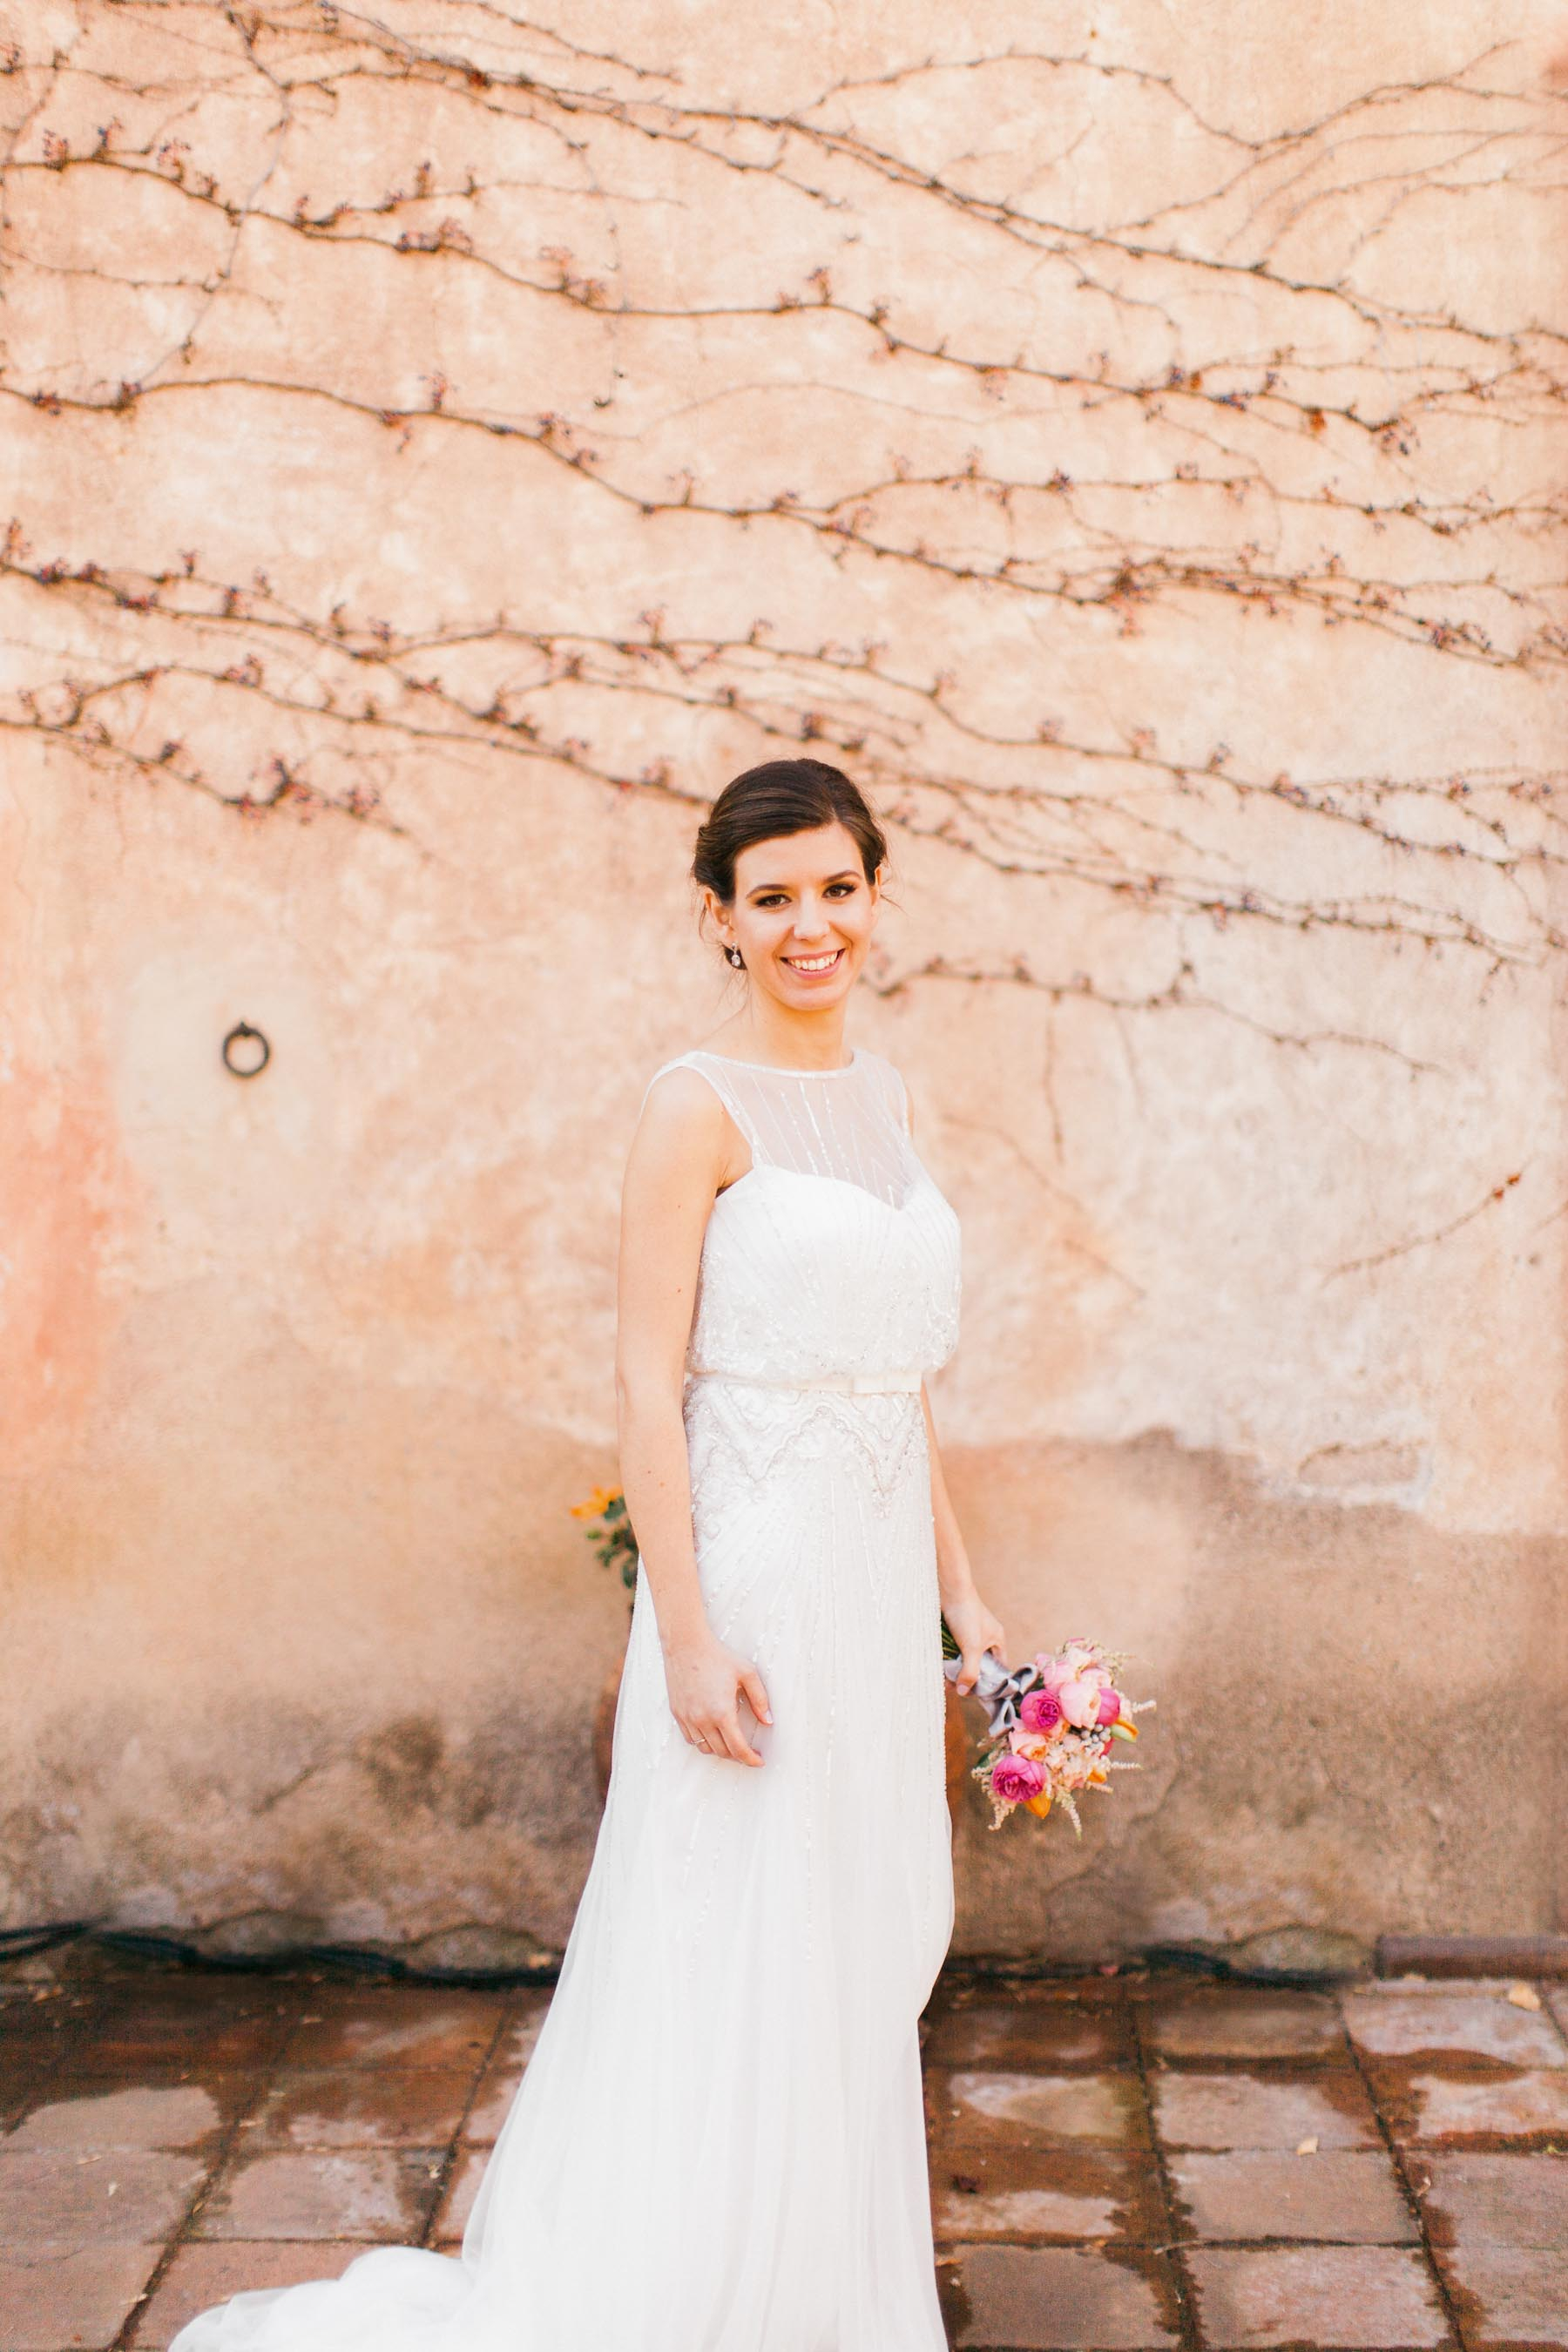 fotografo de bodas Jairo Crena-187